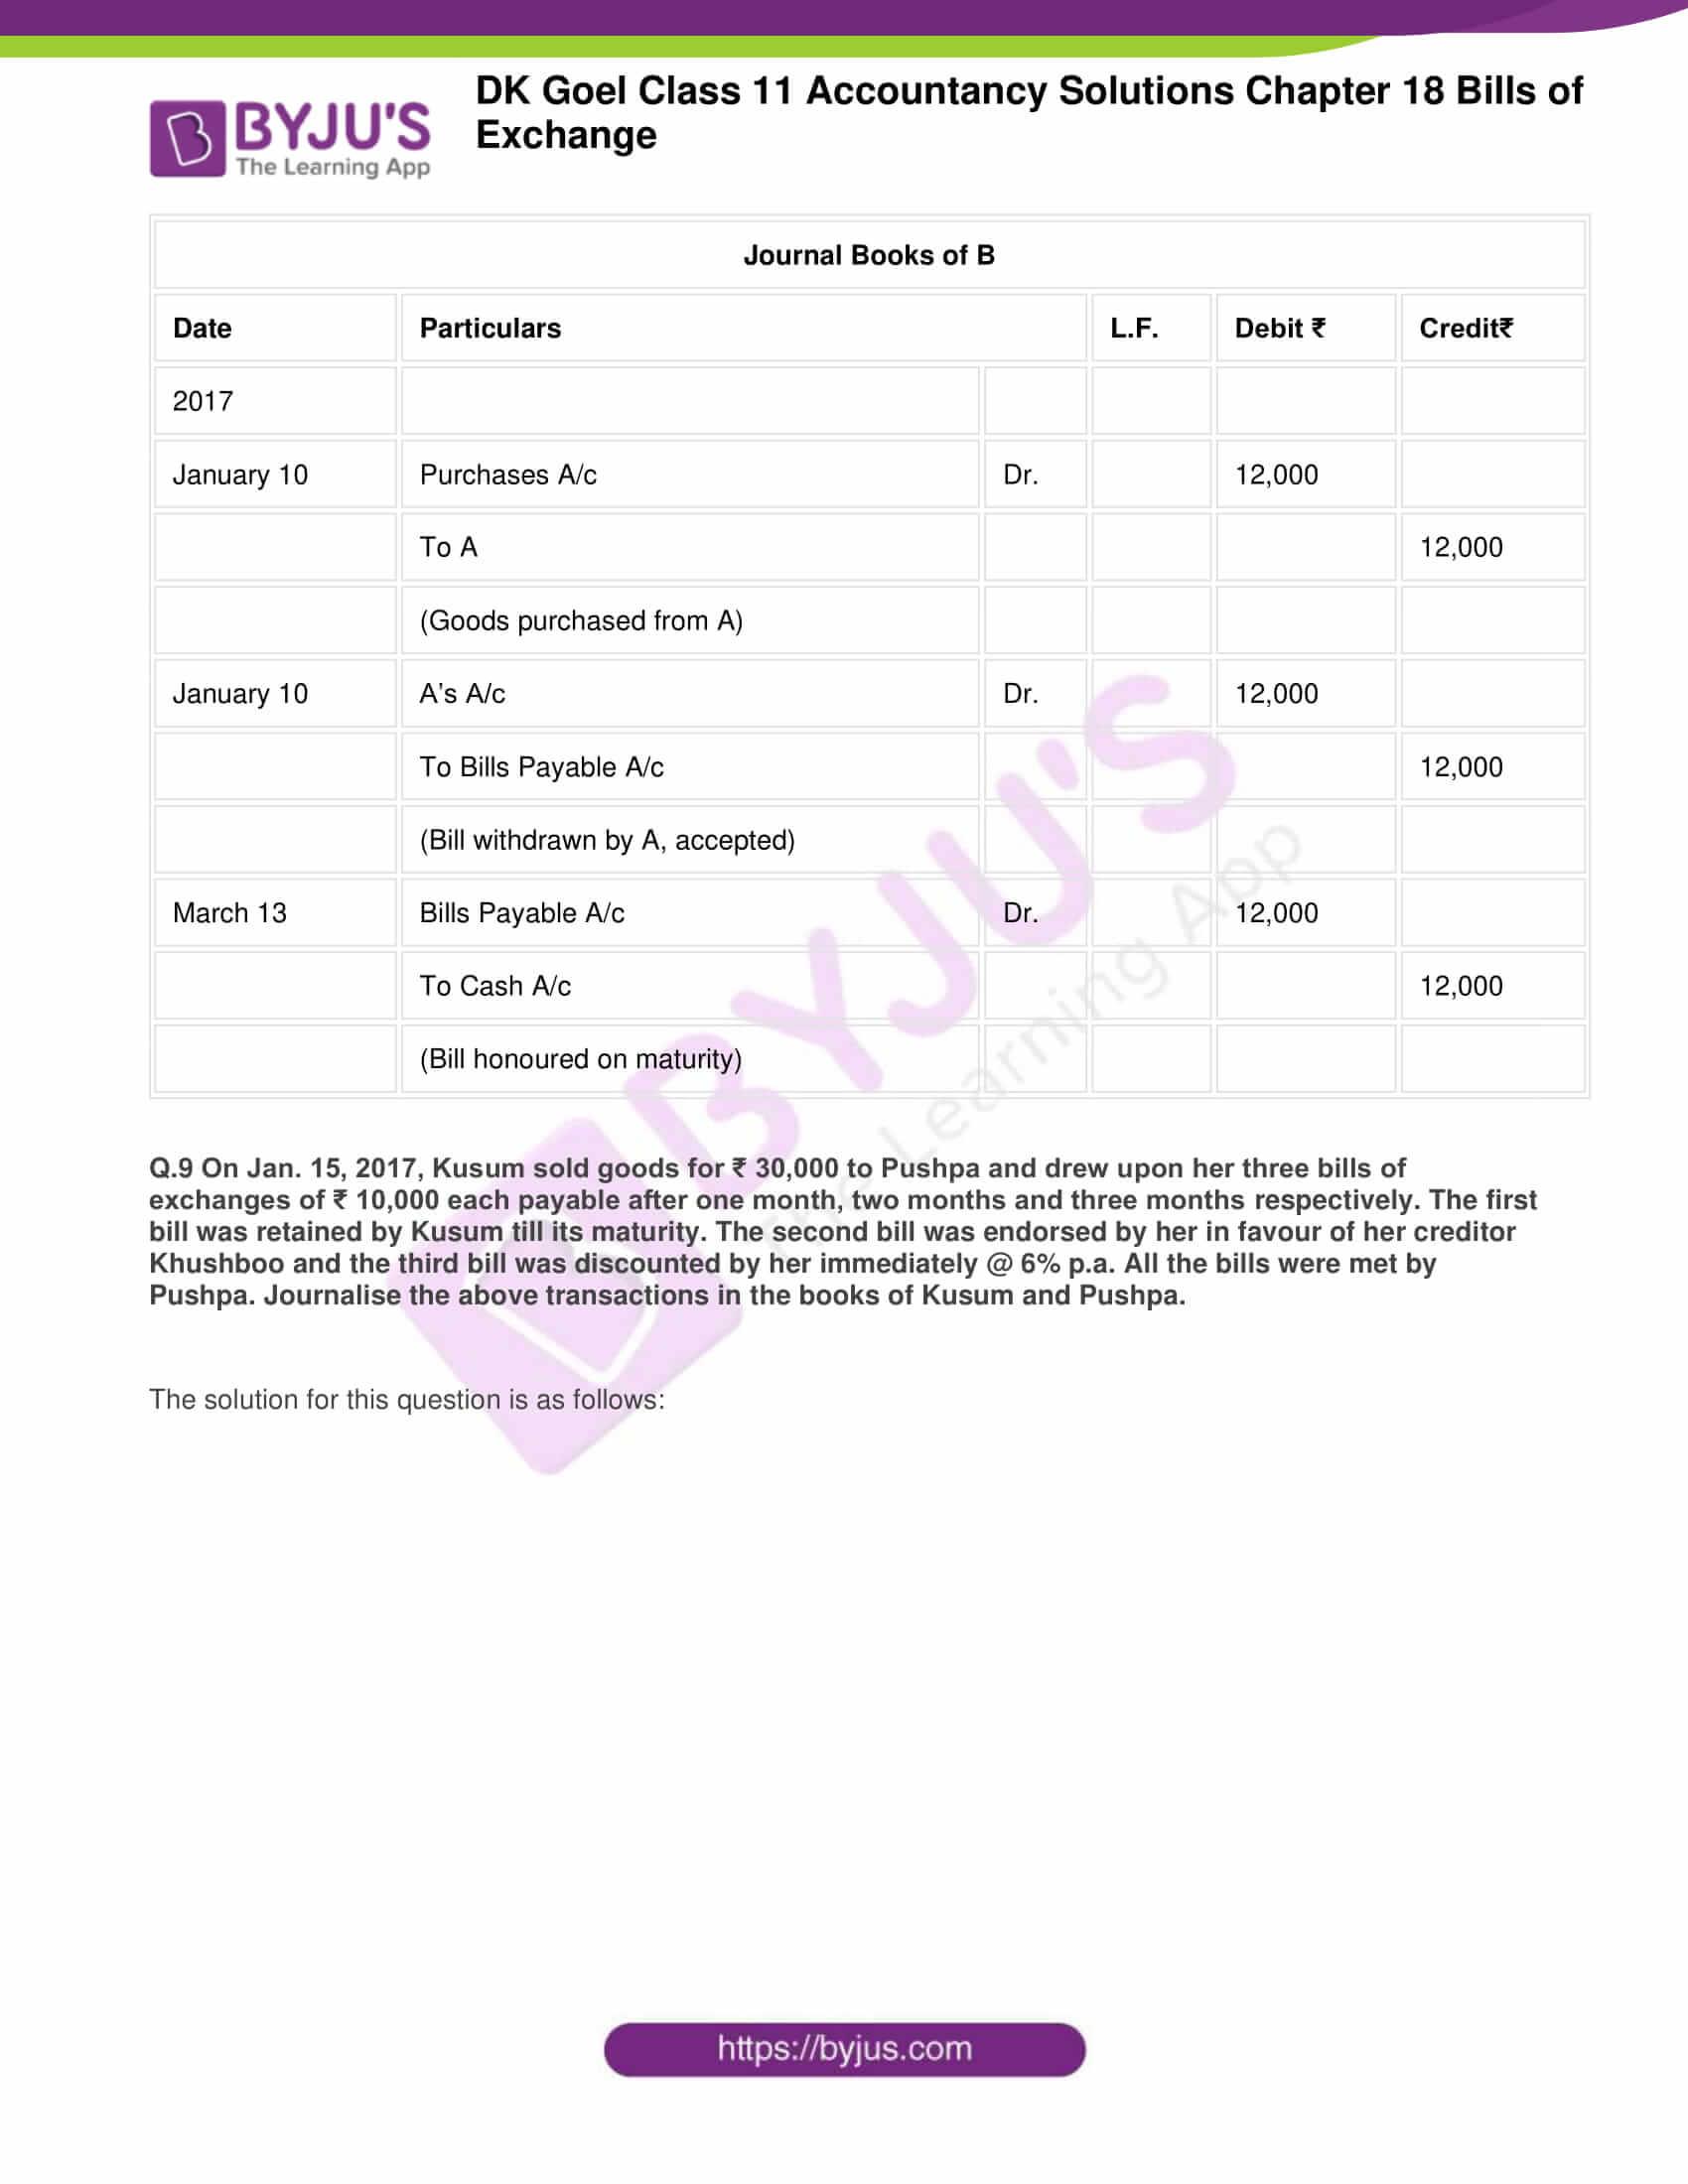 dk goel class 11 accountancy solutions chapter 18 014